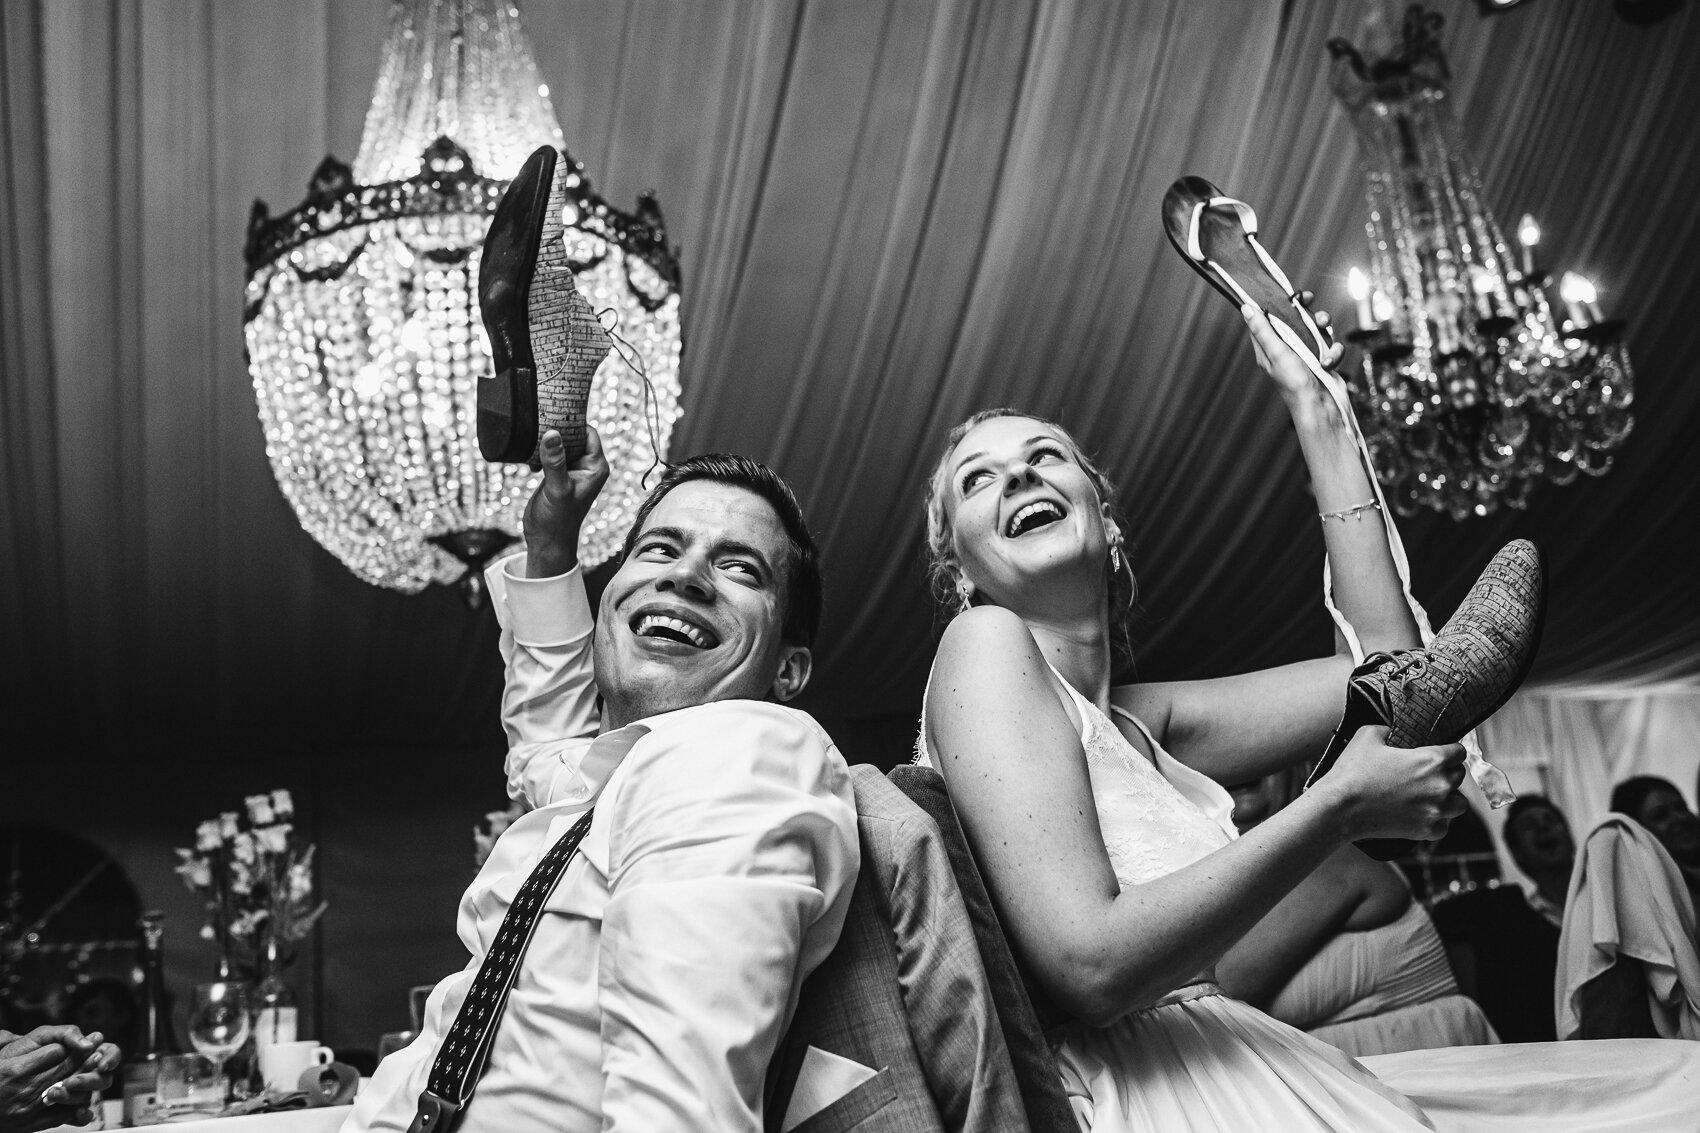 iso800 - huwelijksfotograaf isabo matthias verbeke foundation-33.jpg